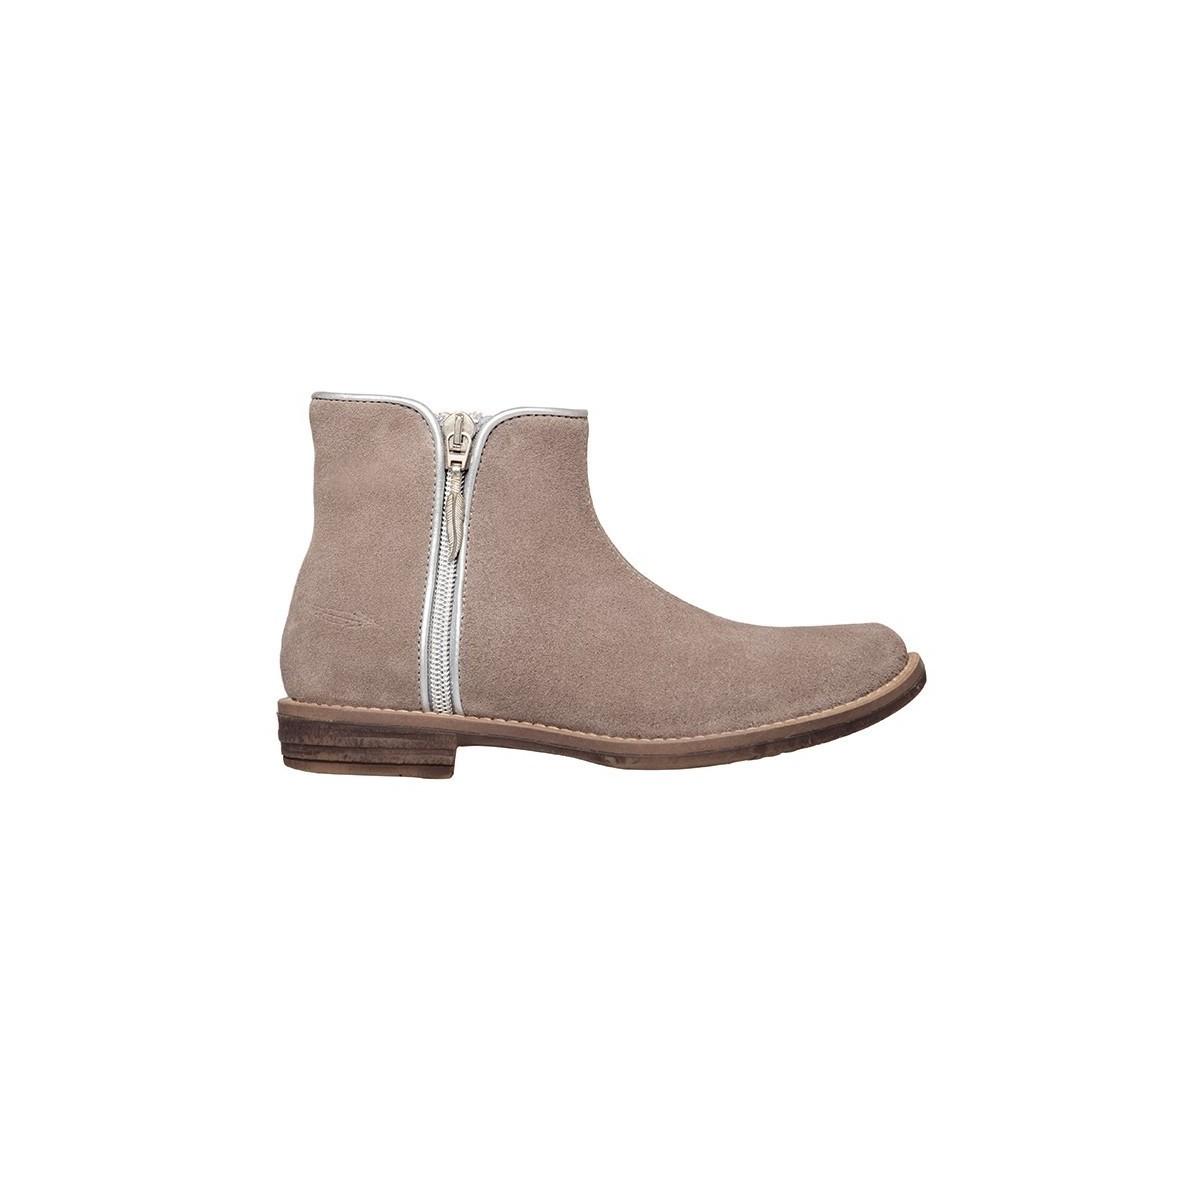 Boots Tijuana taupe